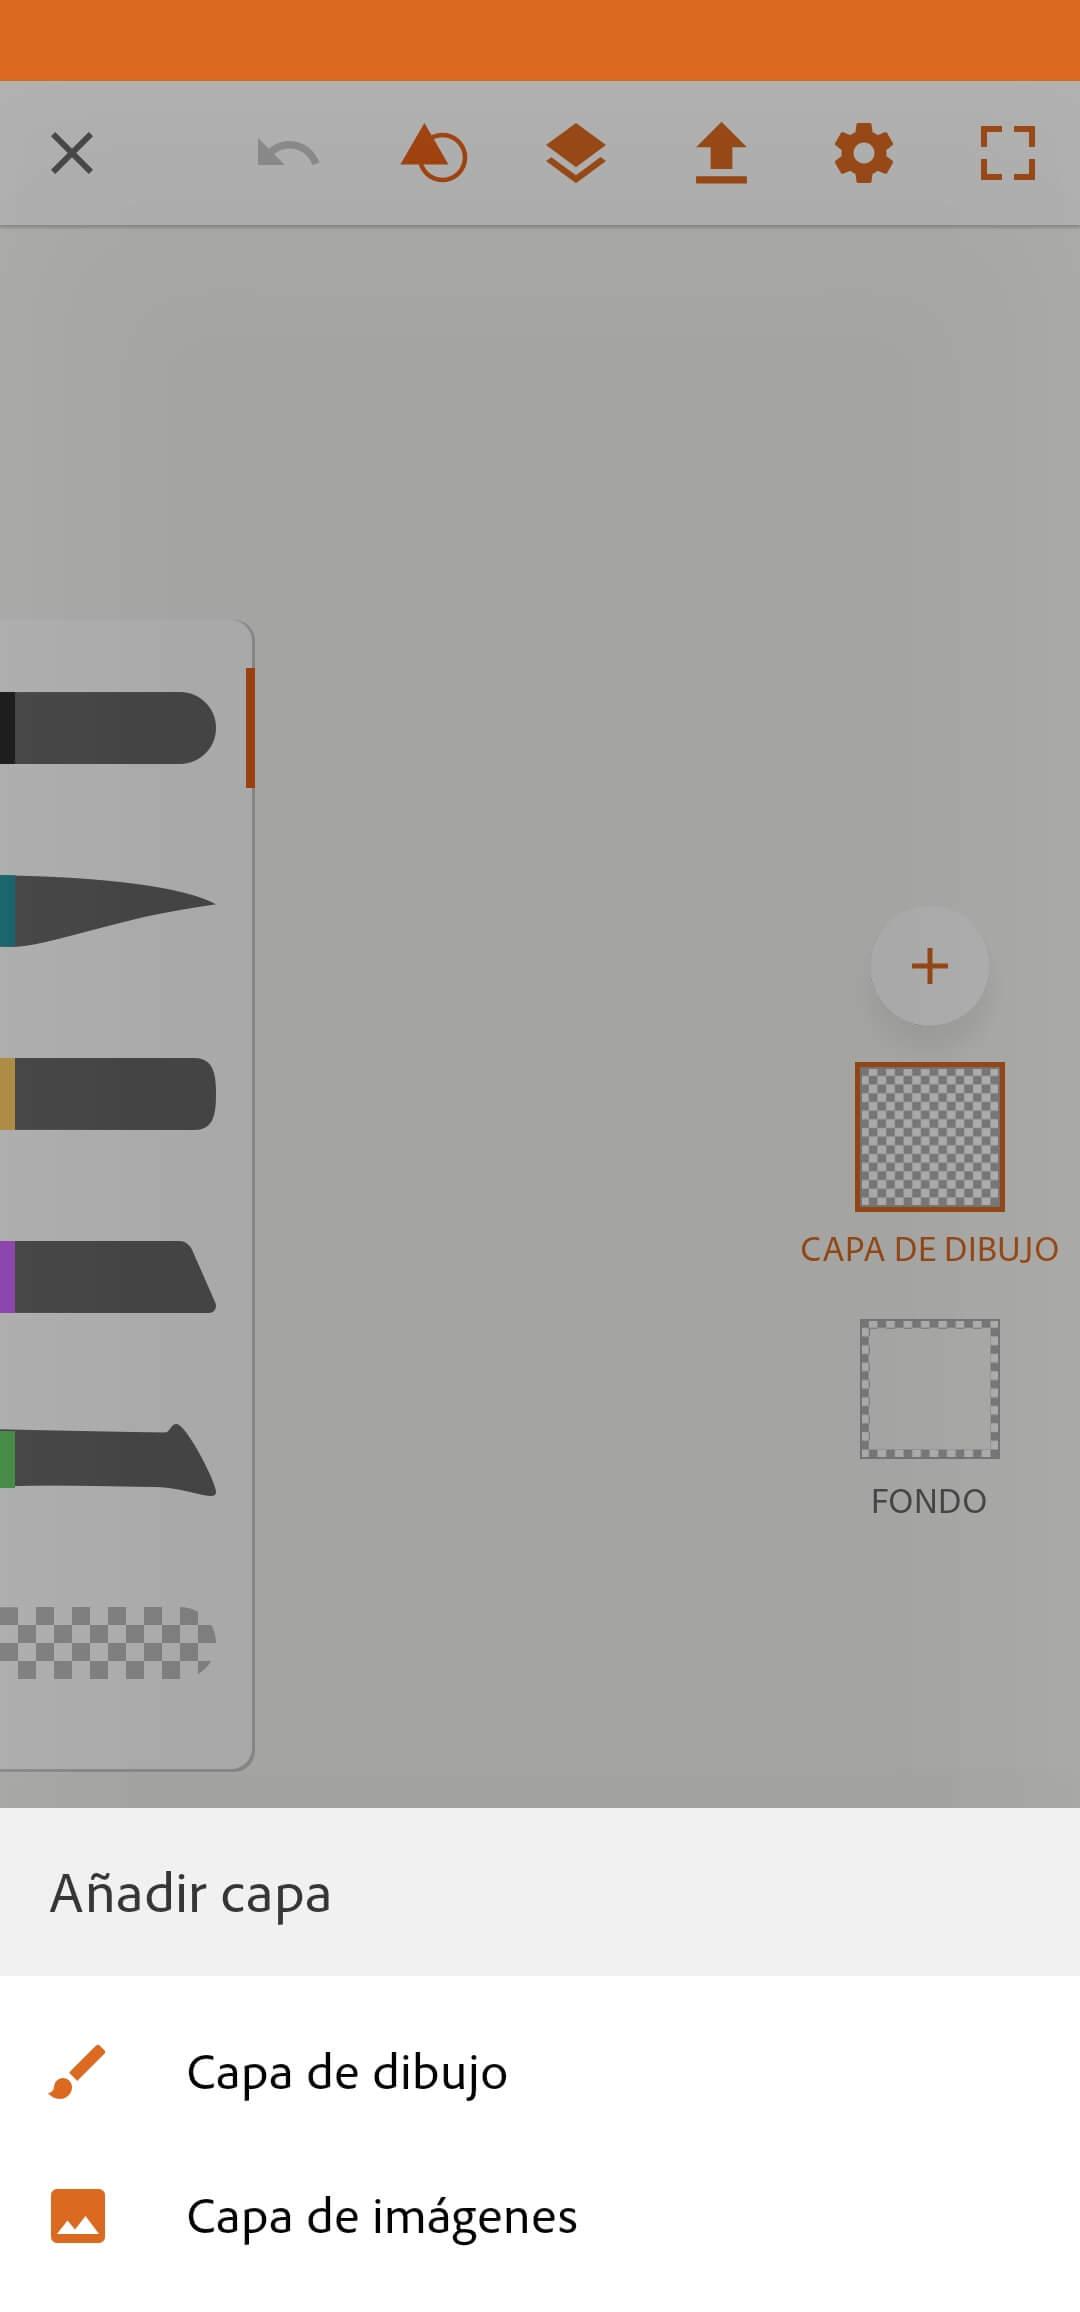 nova capa - adobe draw